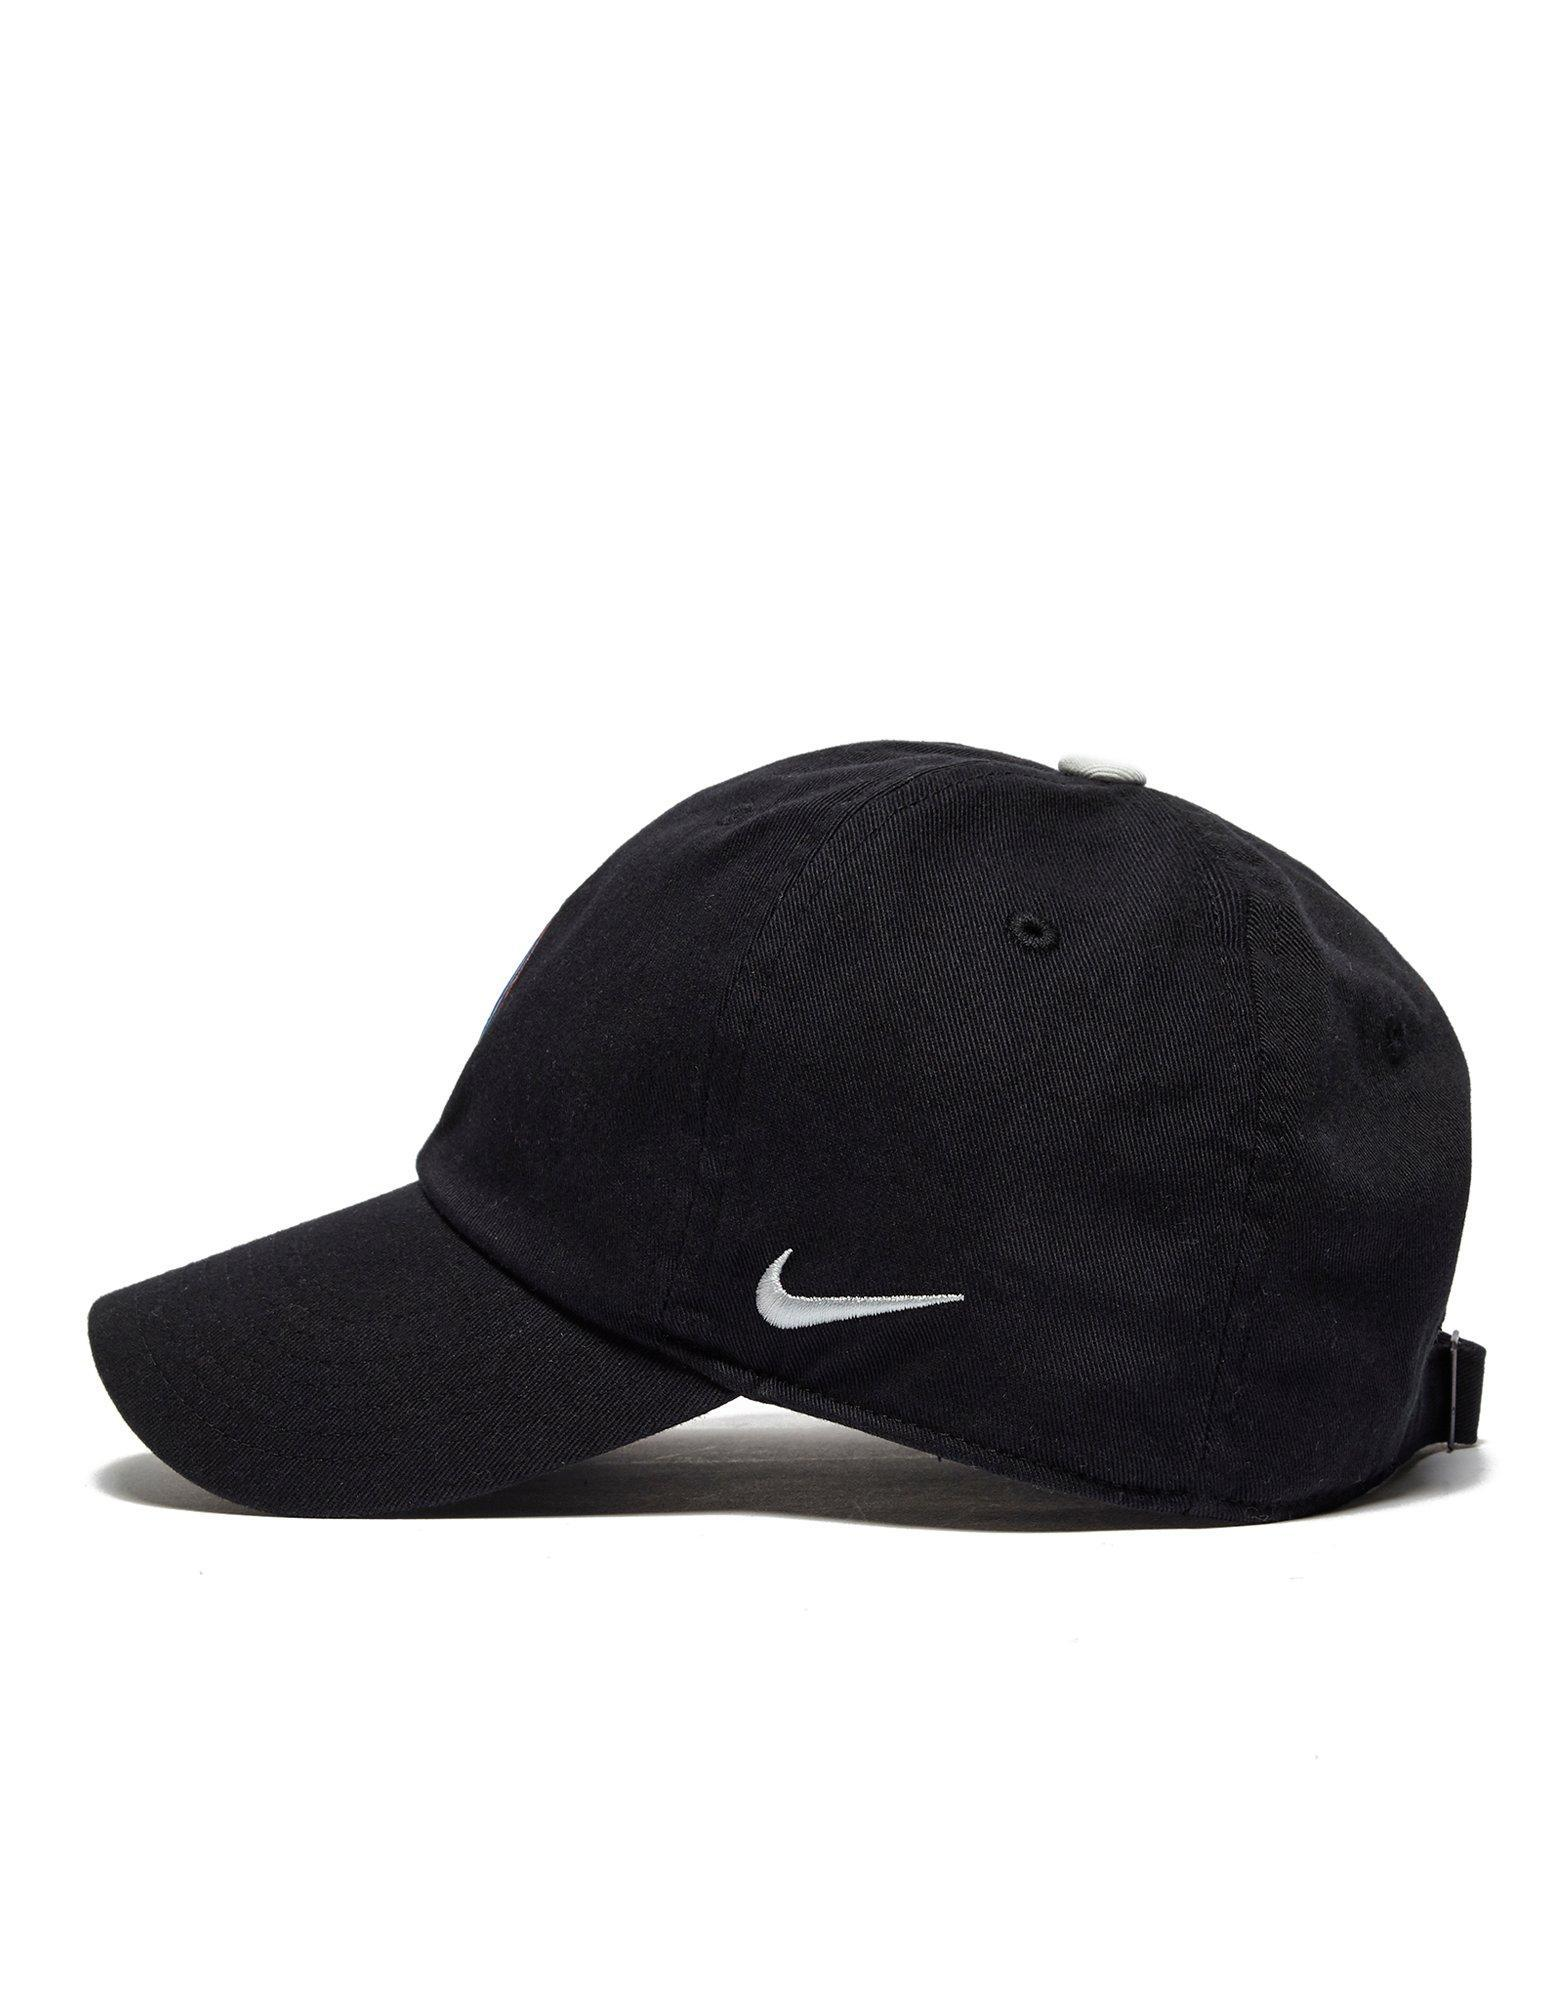 ee10e44c5c1 Lyst - Nike Paris Saint Germain H86 Cap in Black for Men